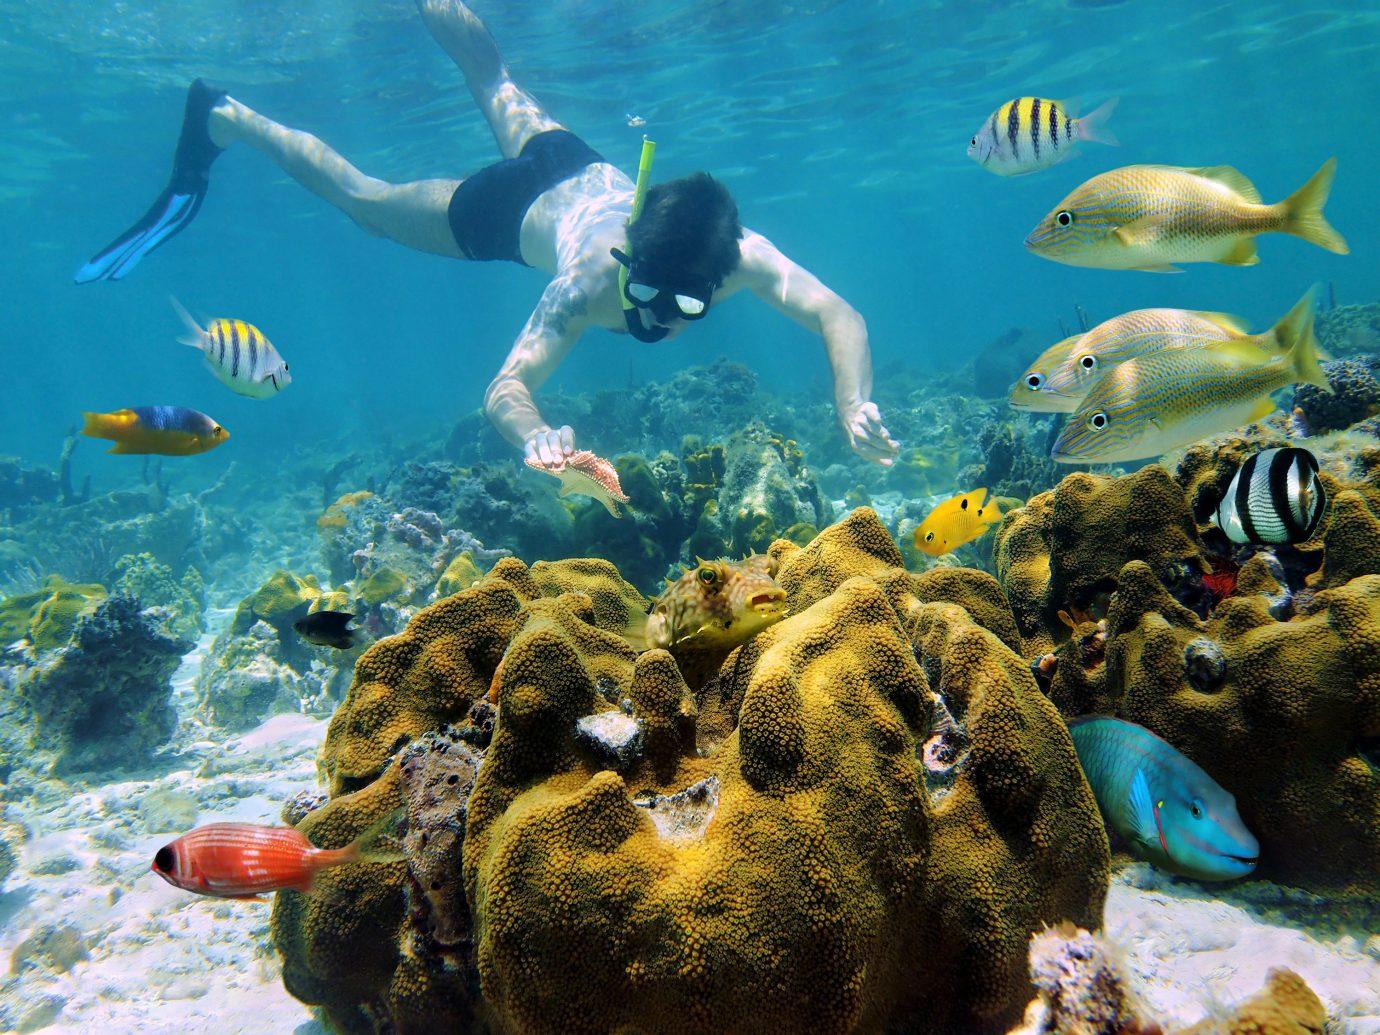 Mexico Trip Ideas Weekend Getaways coral reef water underwater ecosystem marine biology coral reef fish Sea reef organism coral swimming Ocean aquanaut divemaster coastal and oceanic landforms snorkeling marine invertebrates fish stony coral shoal